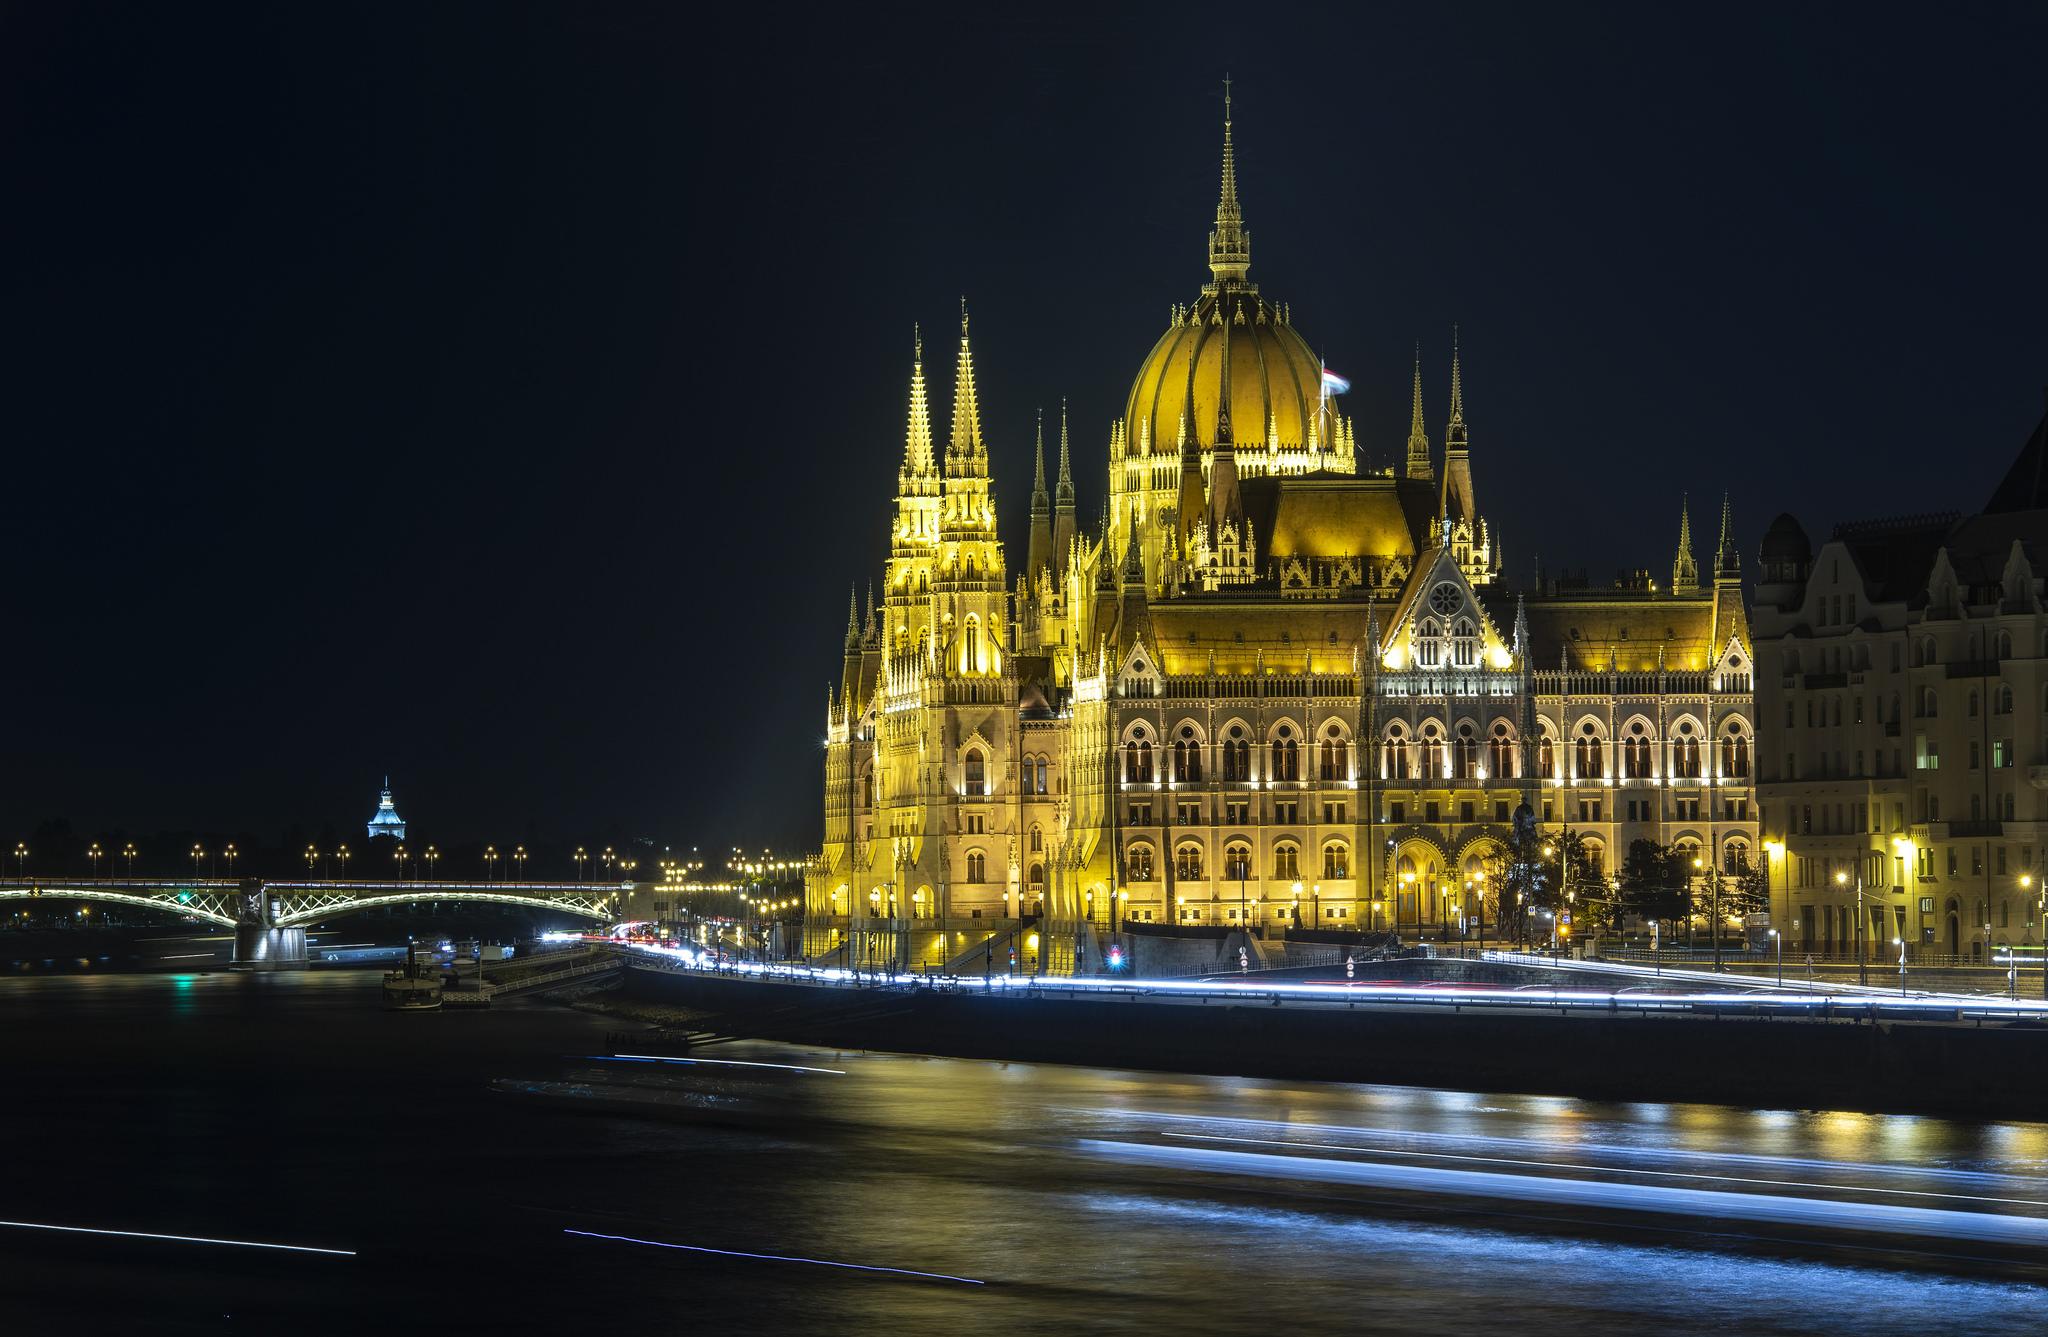 Dazzling Danube  - Hungarian Parliament (Budapest, Hungary)